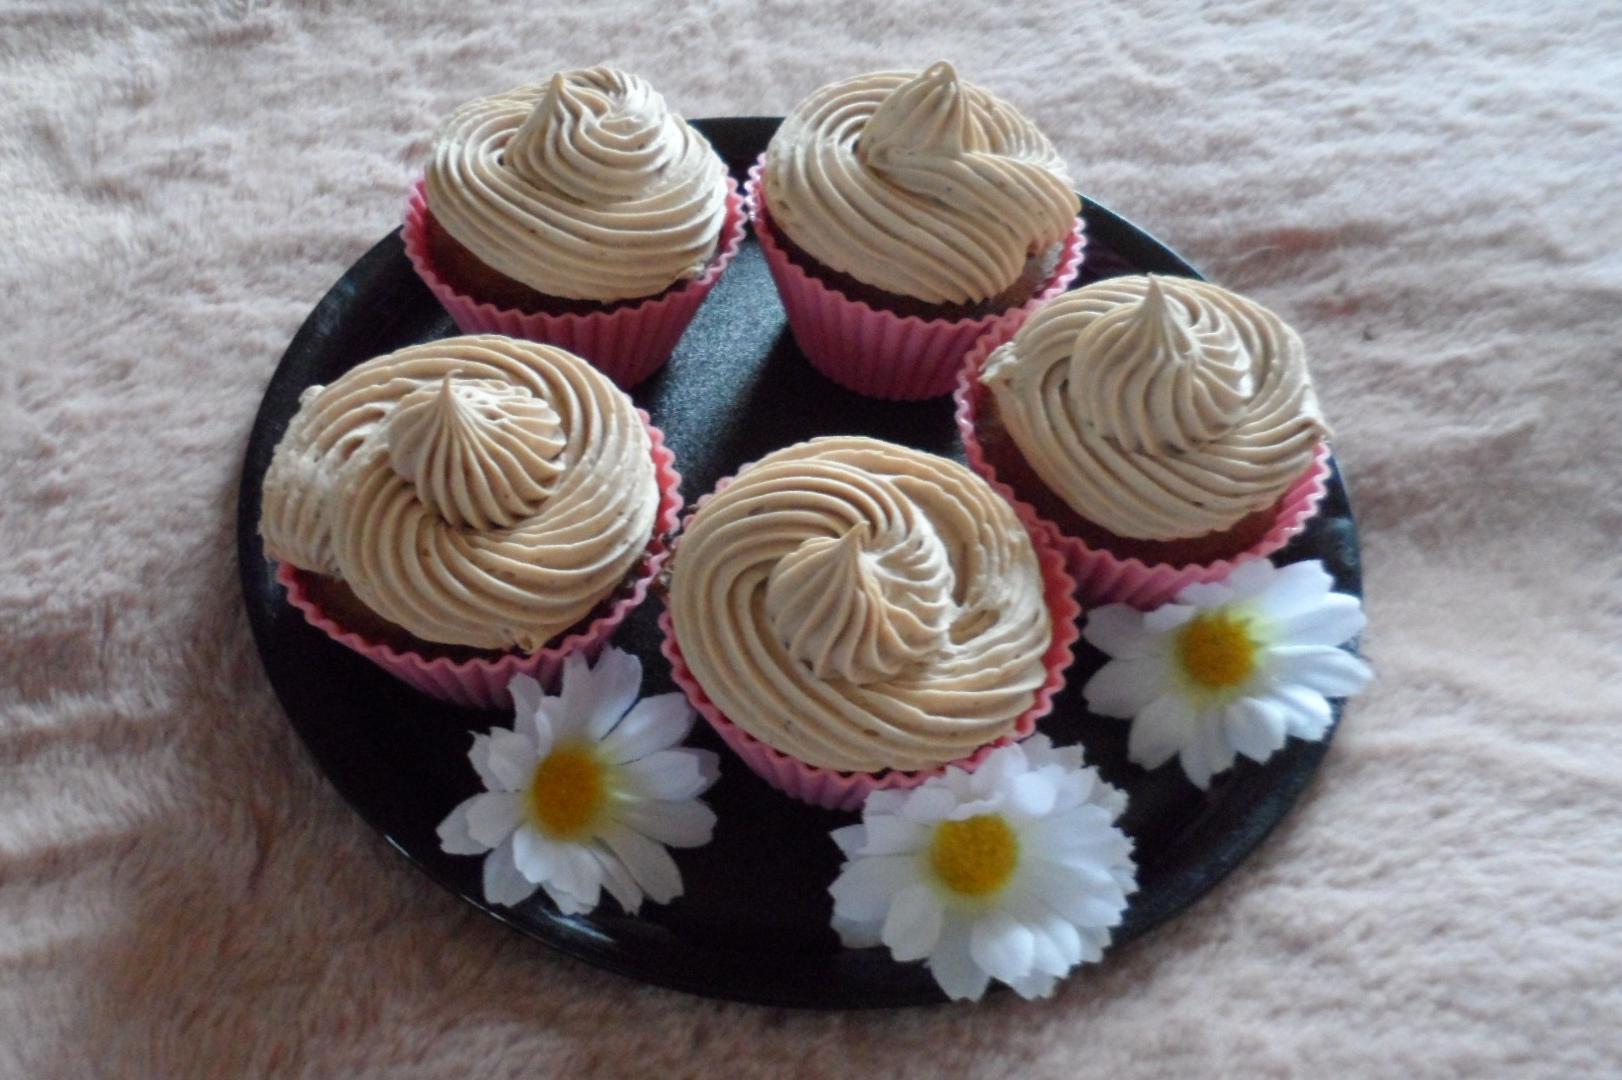 Bananen-Vollkorn-Cupcake mit Lupinen-Schoko-Sahne